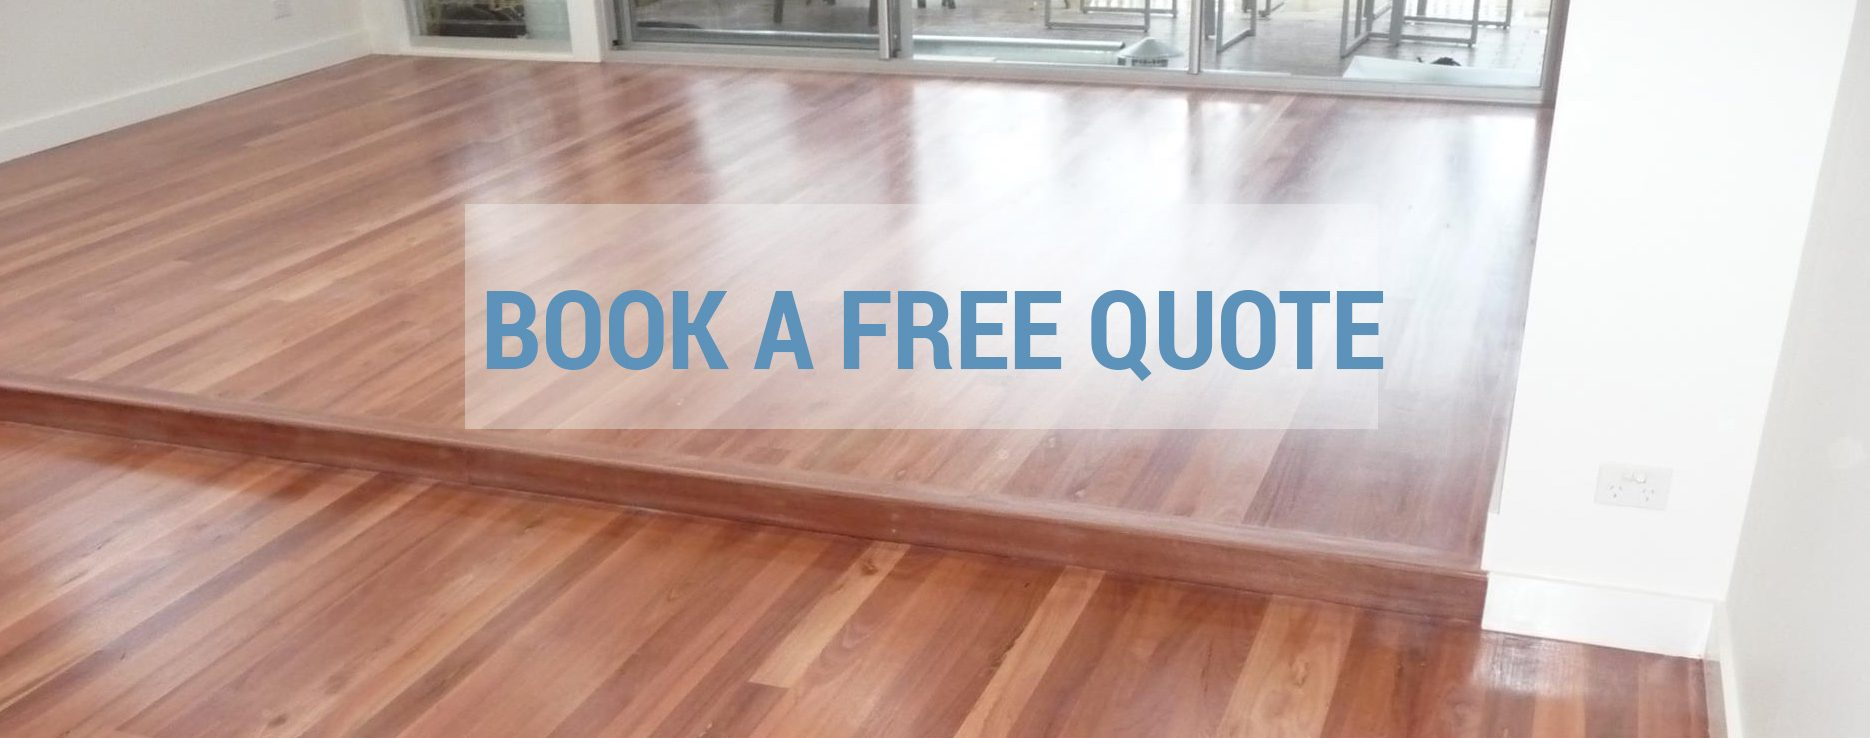 book quote floor sanding polishing sydney